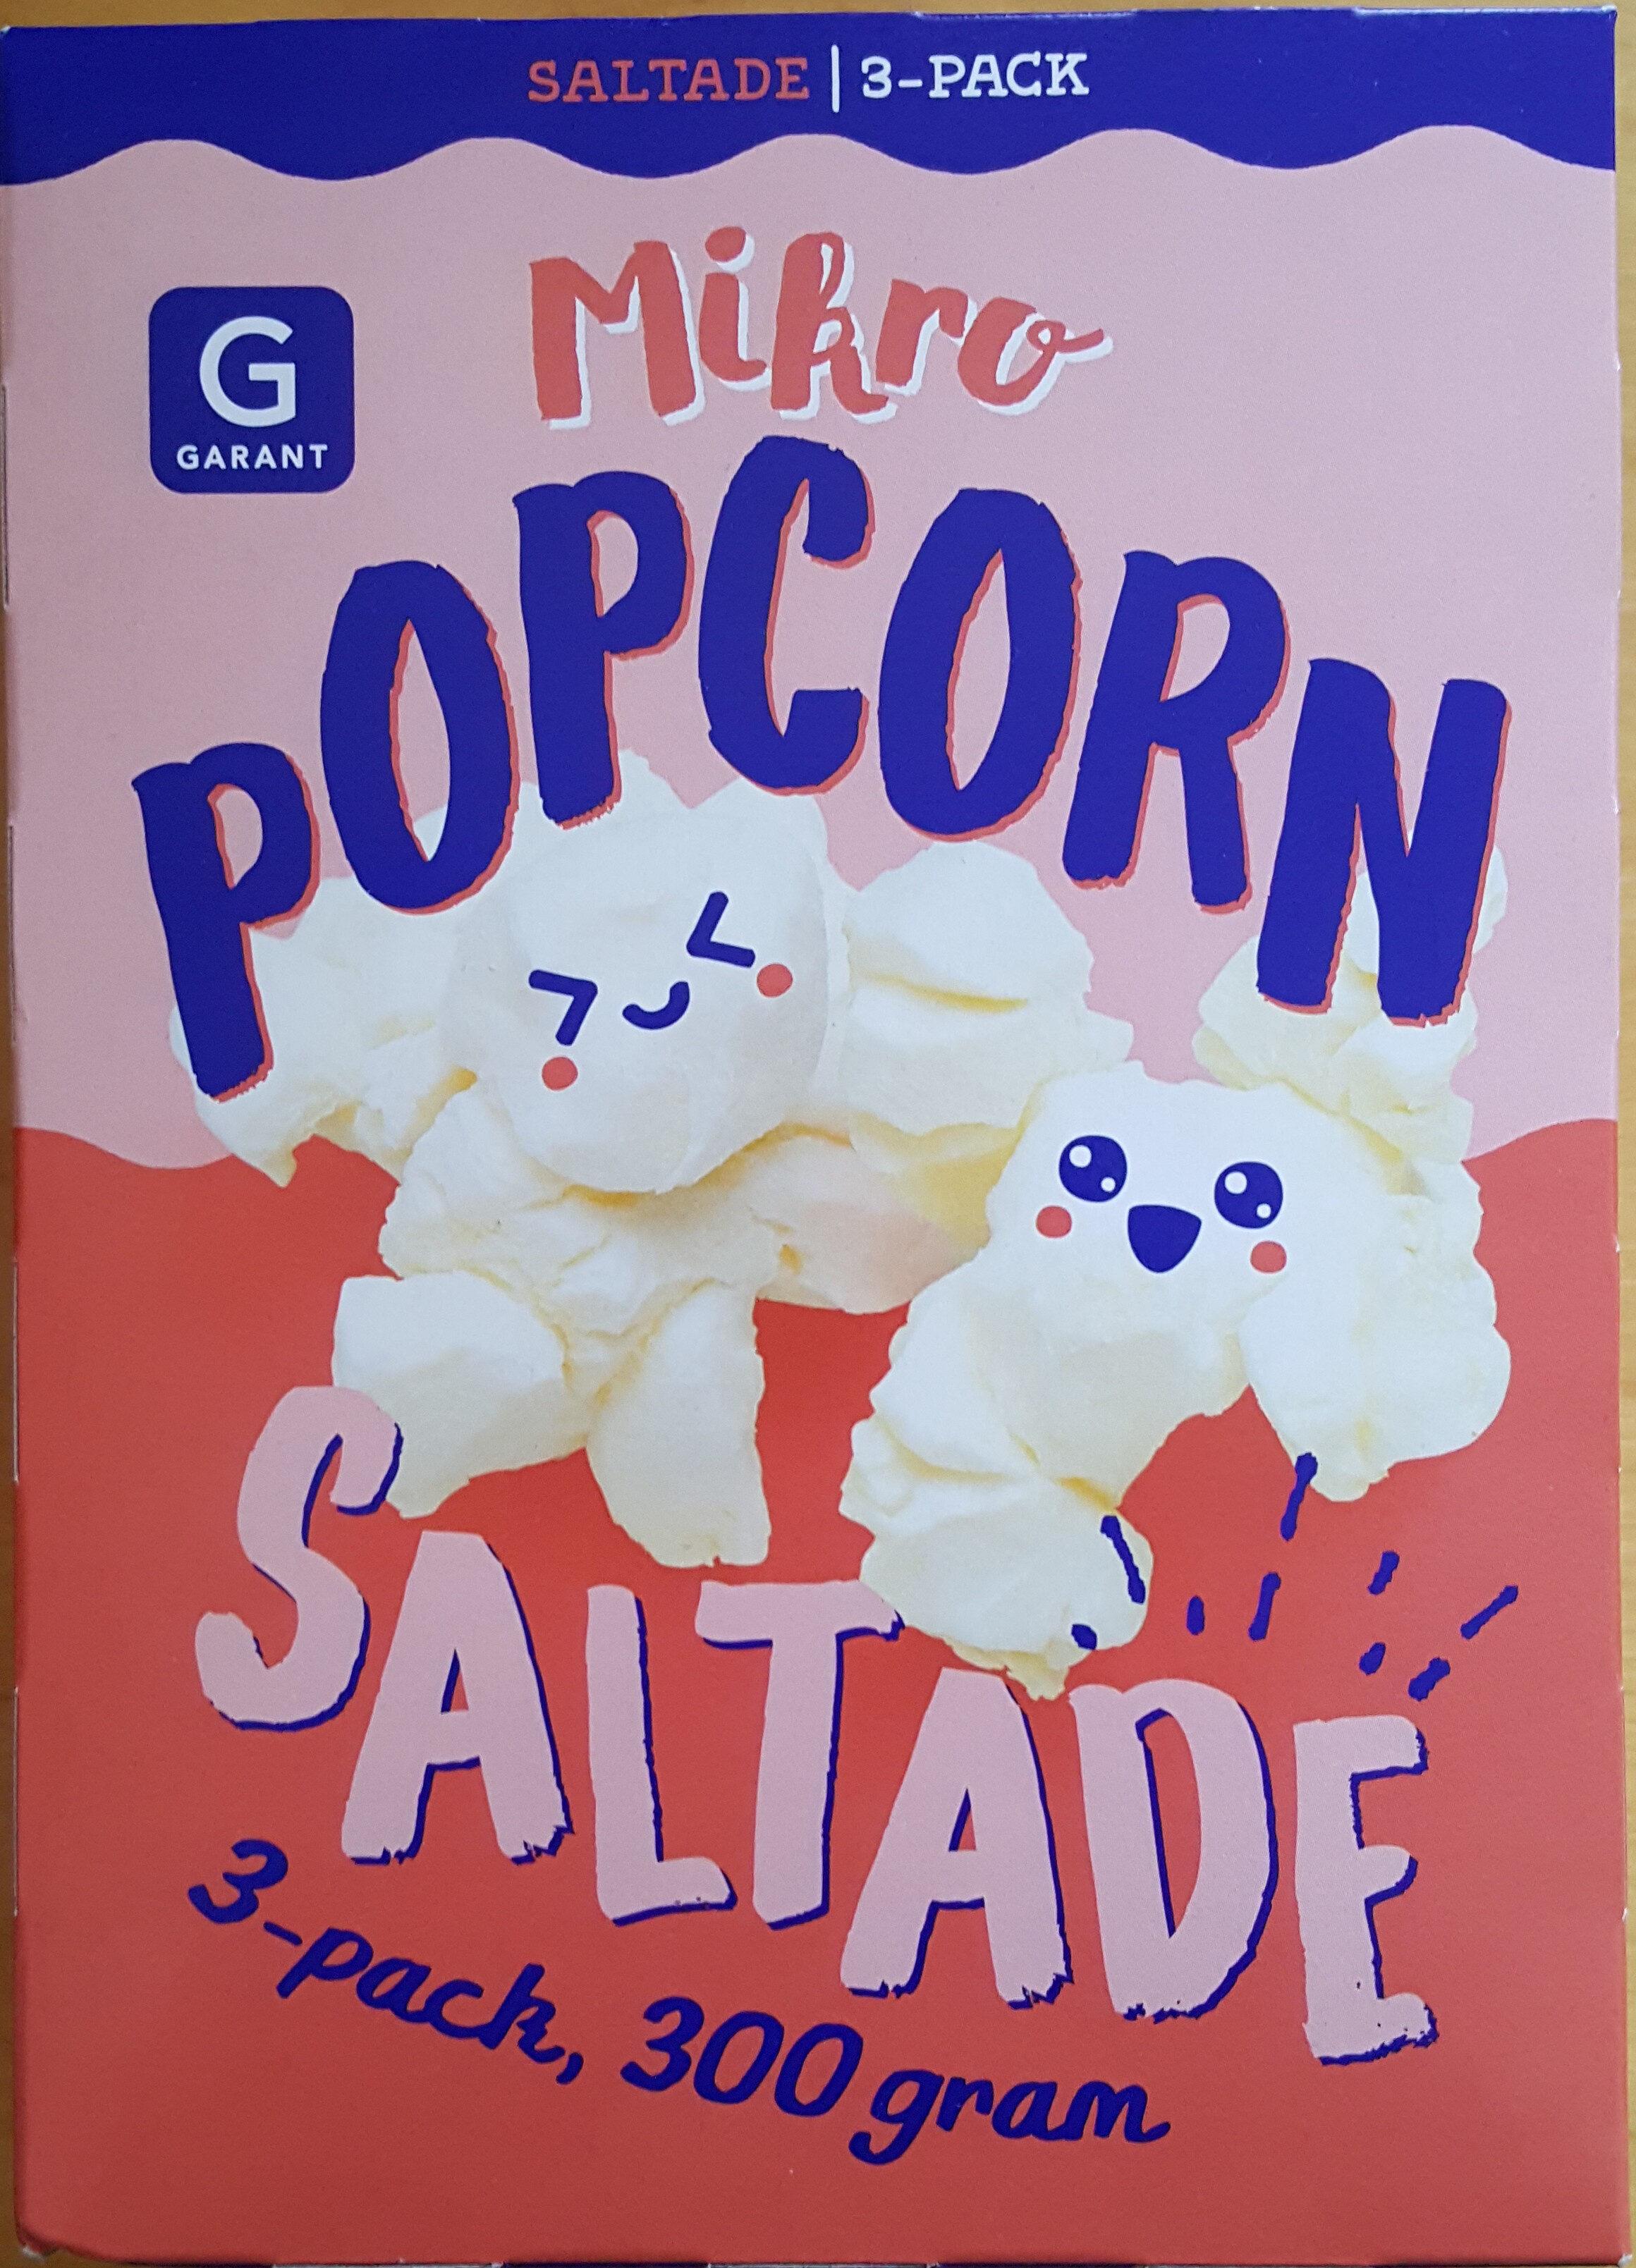 Micropopcorn - Saltade, 3-pack - Produit - sv